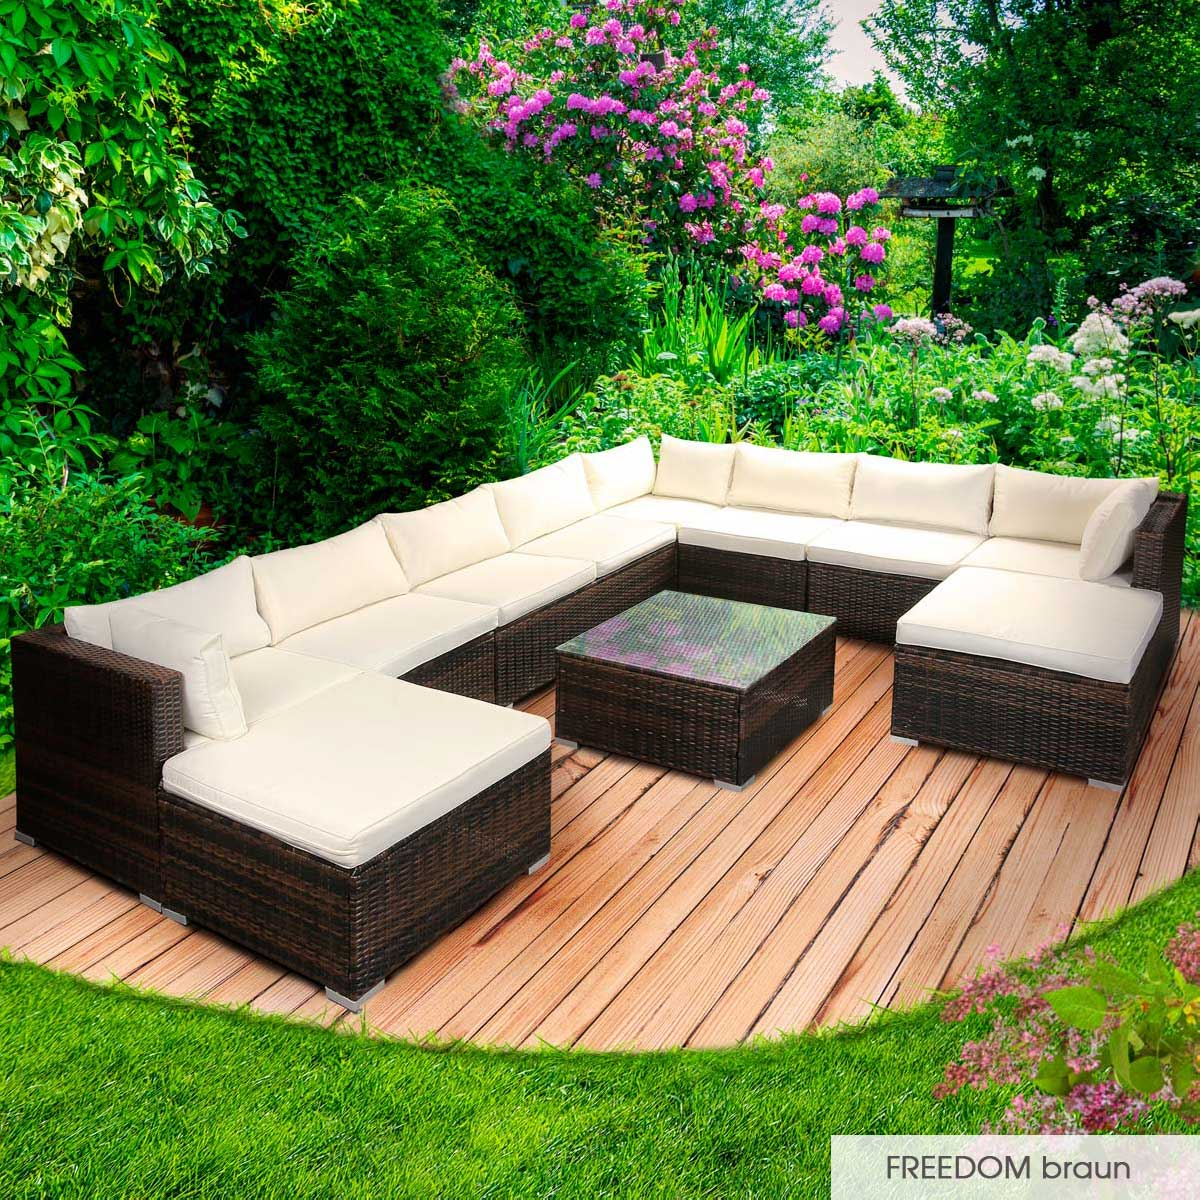 Gartenmoebel-Poly-Rattan-Lounge-Moebel-Sitzgarnitur-Gartengarnitur-Sitzgruppe-Sofa Indexbild 47